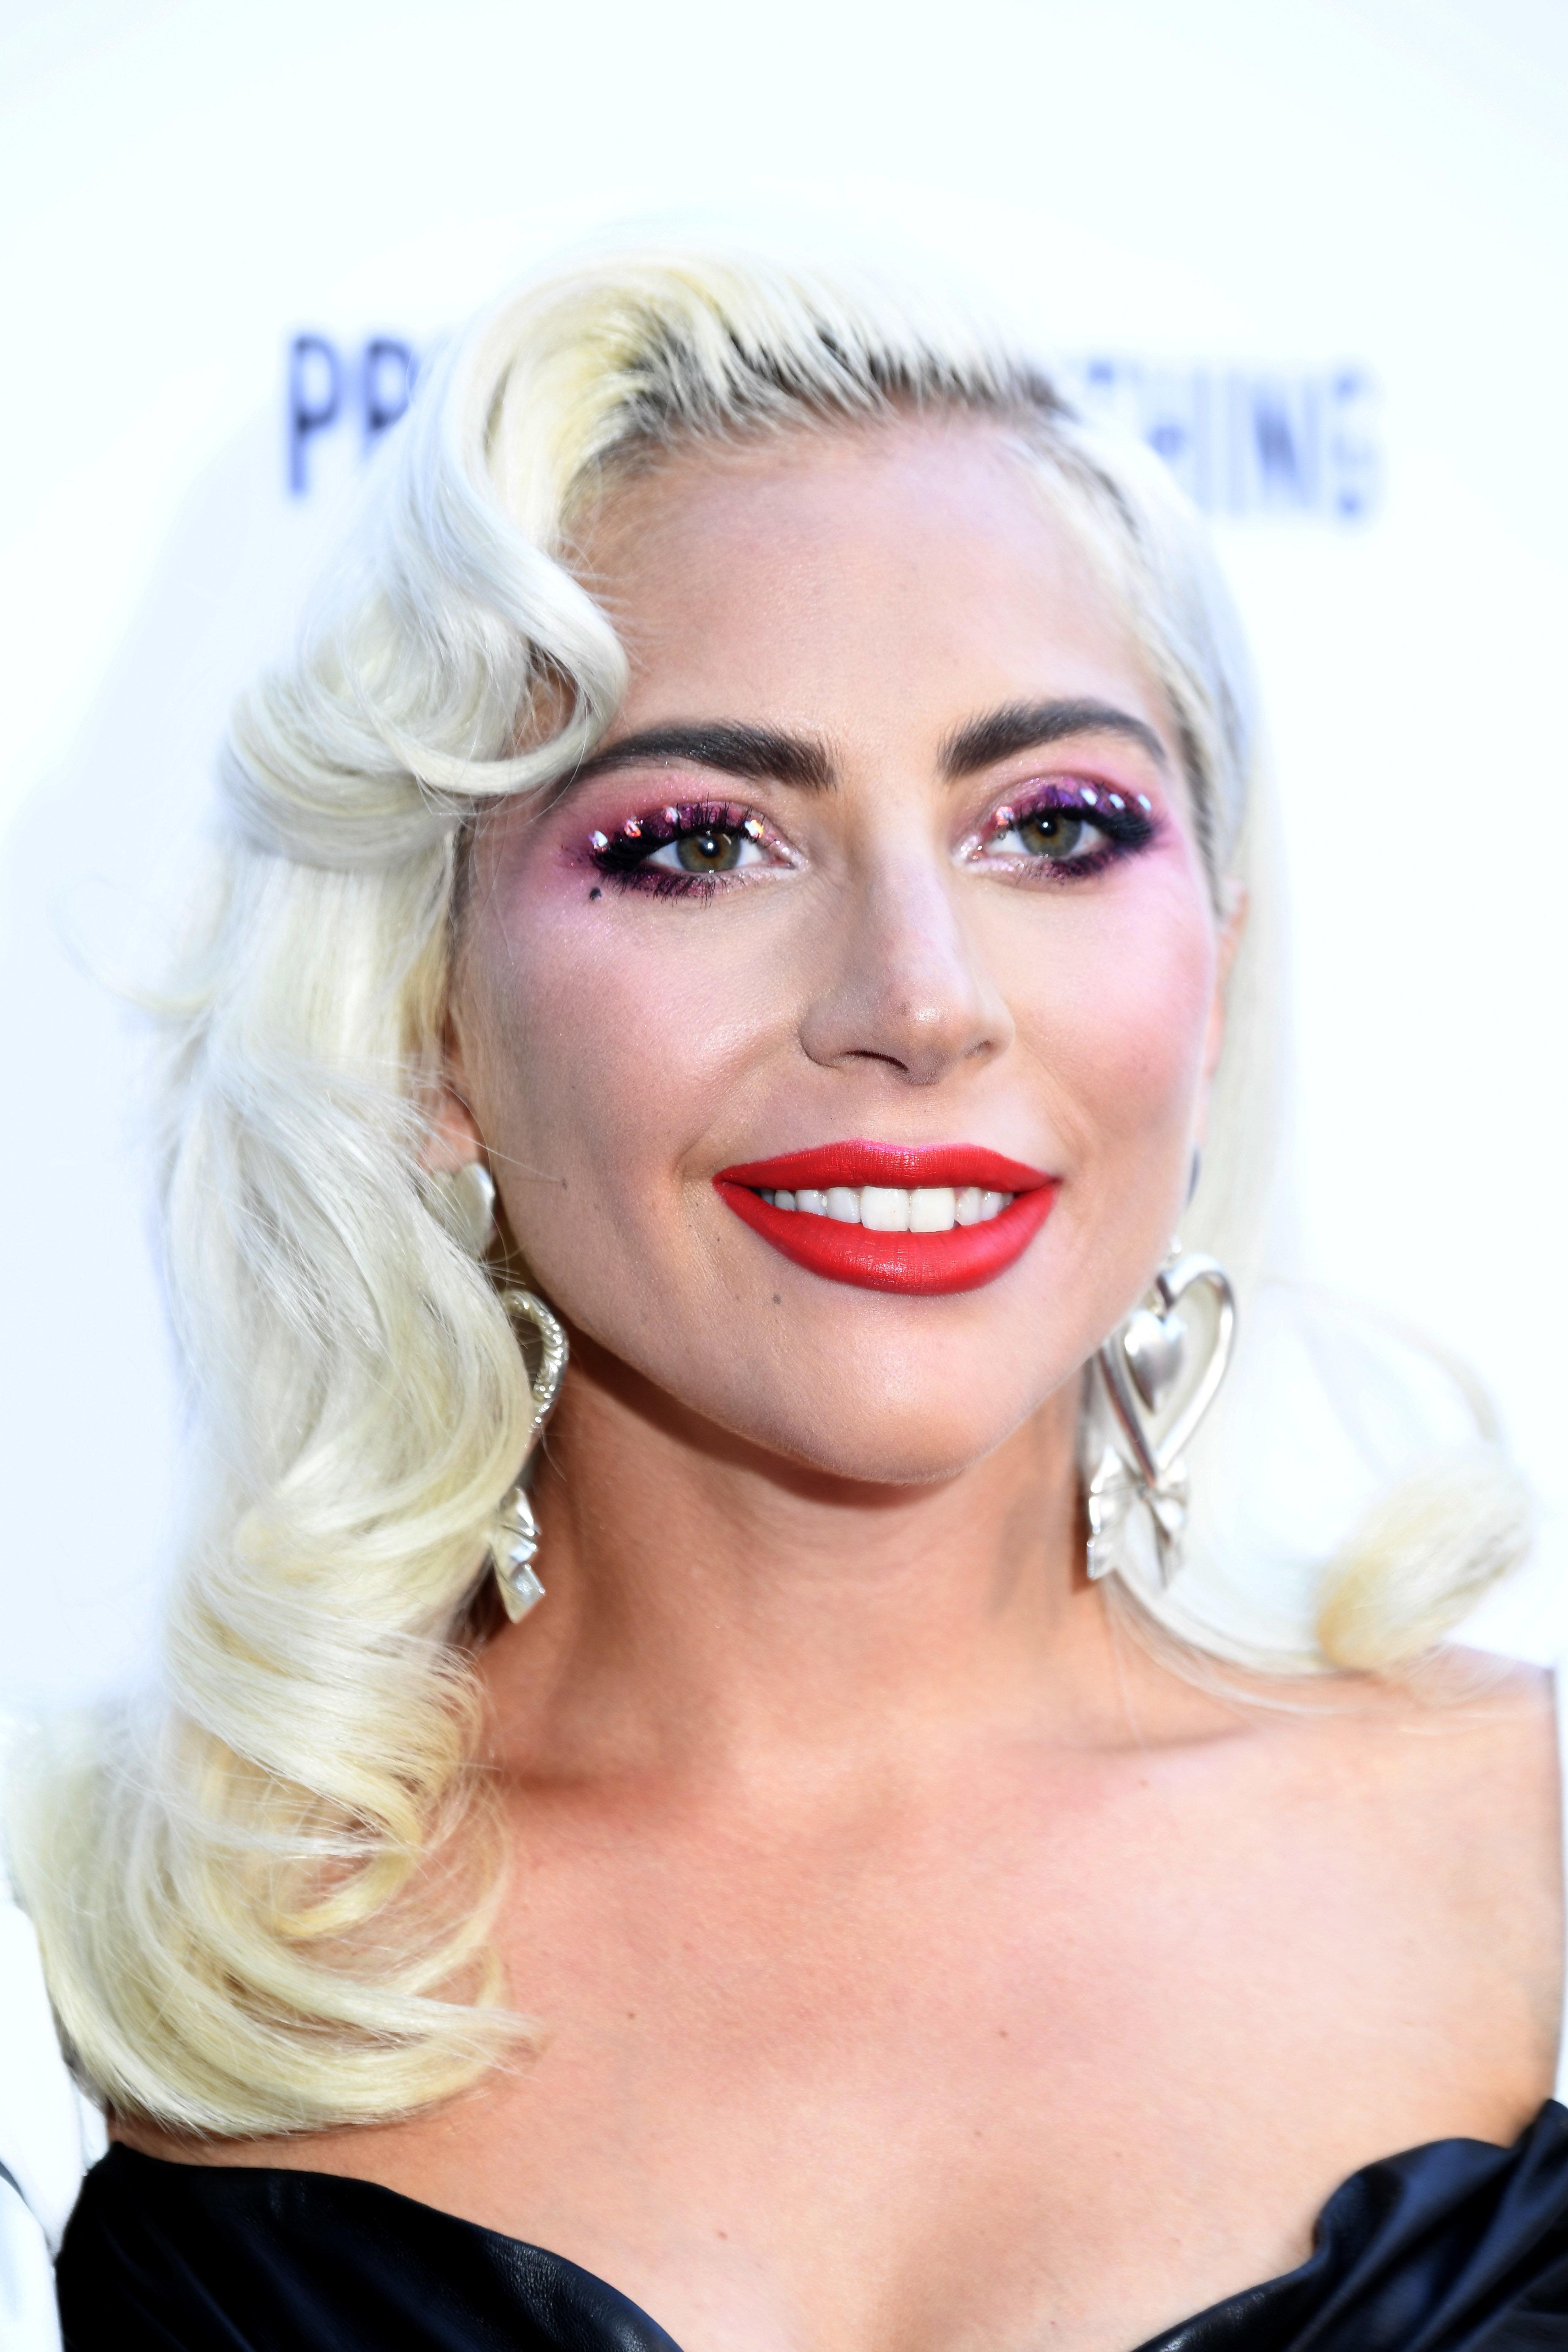 As 10 cidades do Brasil que mais escutaram Gaga no último ano, segundo o